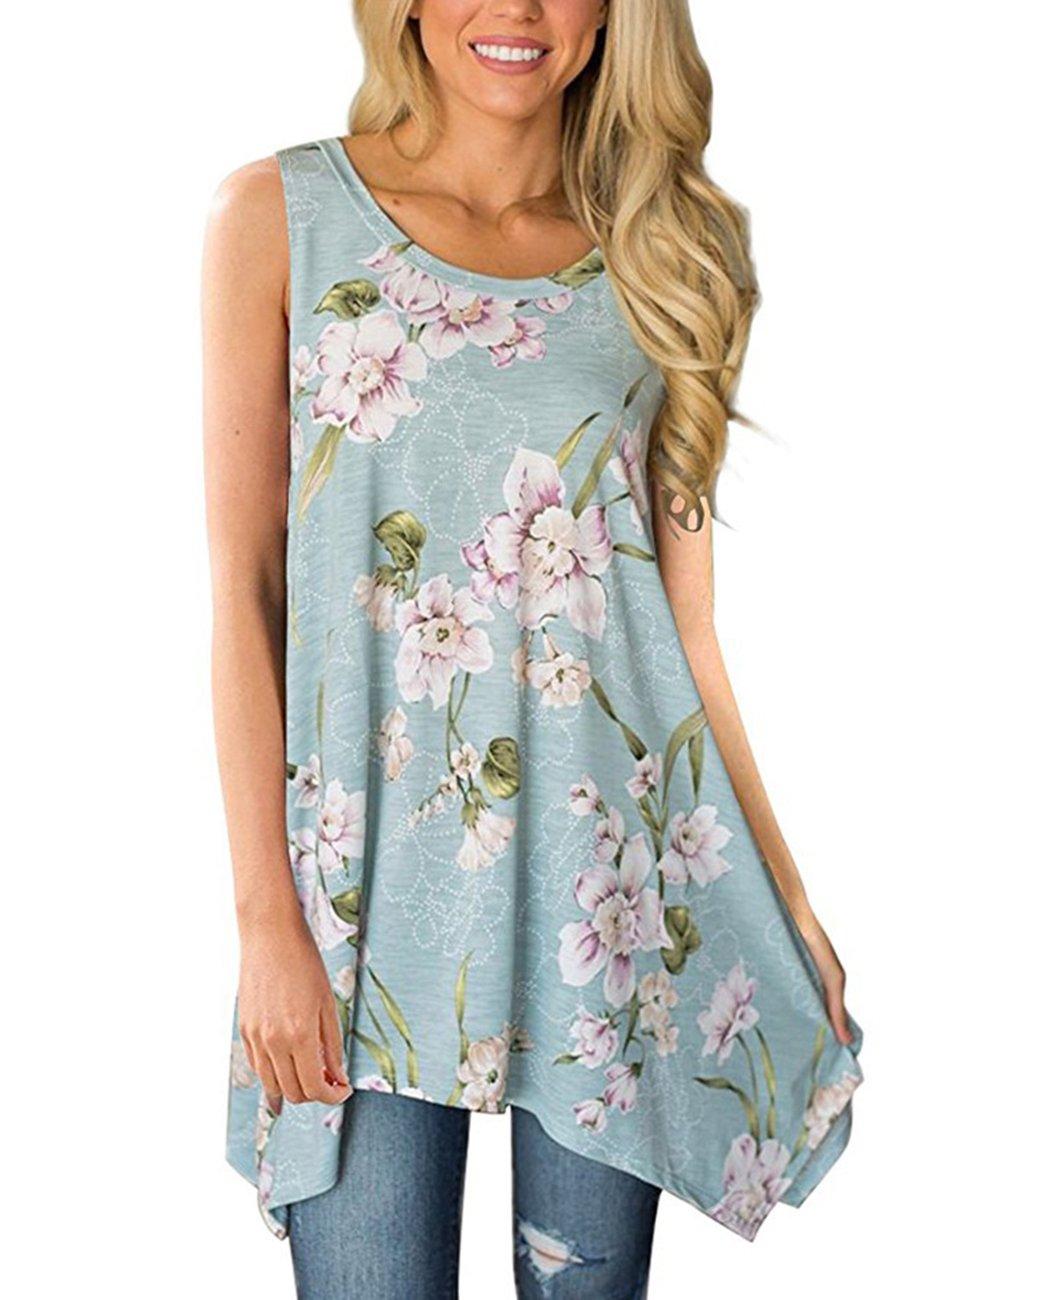 9cd016abb4804 Top 10 wholesale Stylish Long Tunics - Chinabrands.com